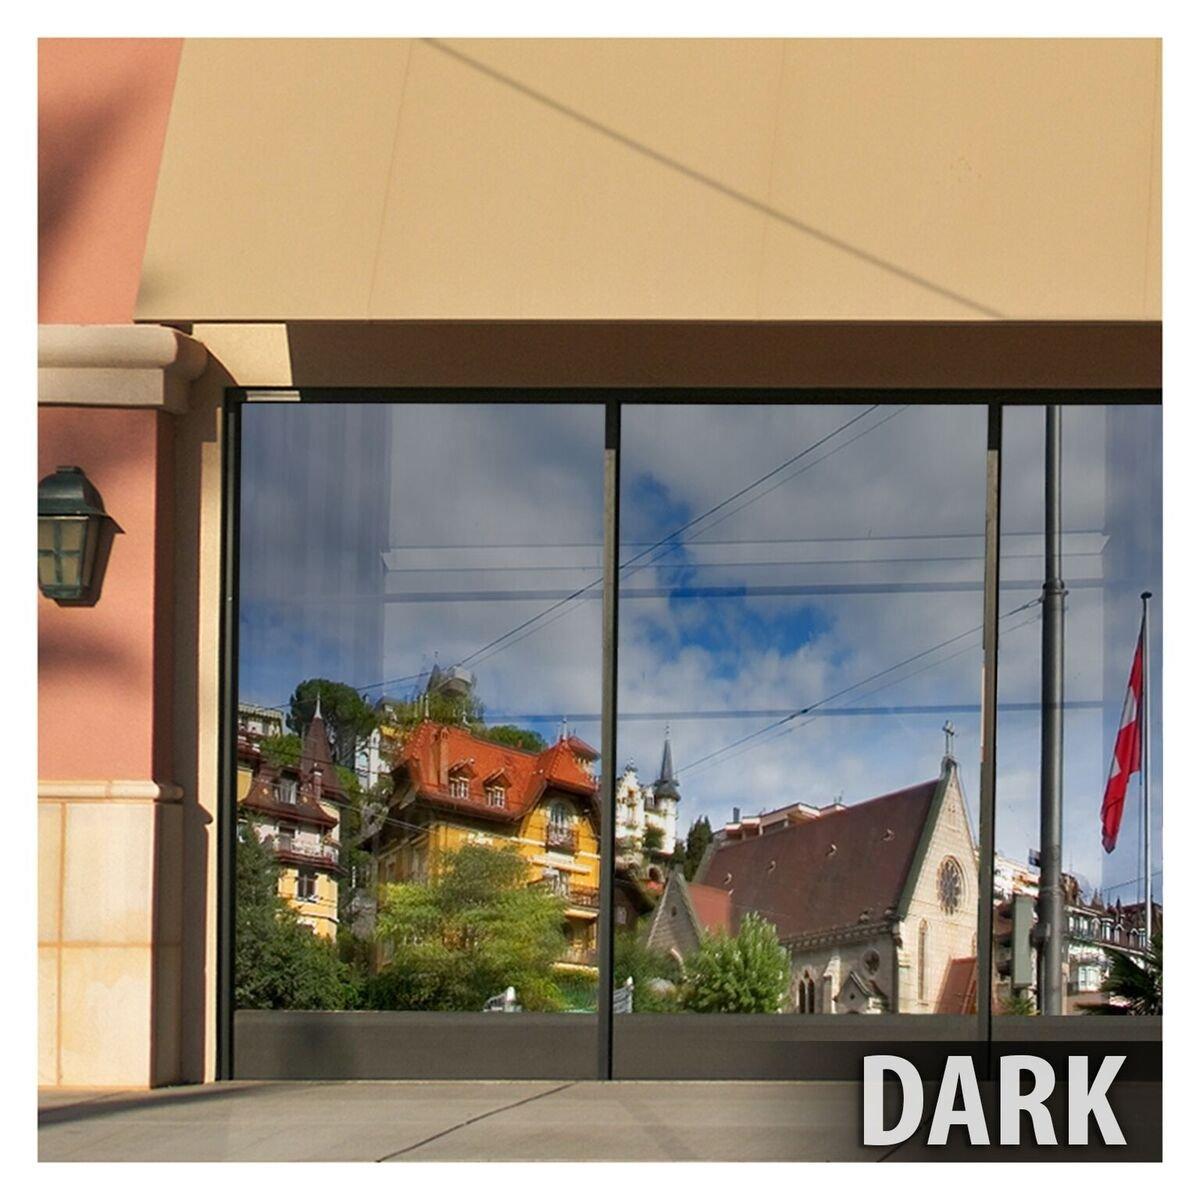 BDF S15 Window Film One Way Mirror Silver 15 (Dark) - 48in X 100ft by Buydecorativefilm (Image #4)